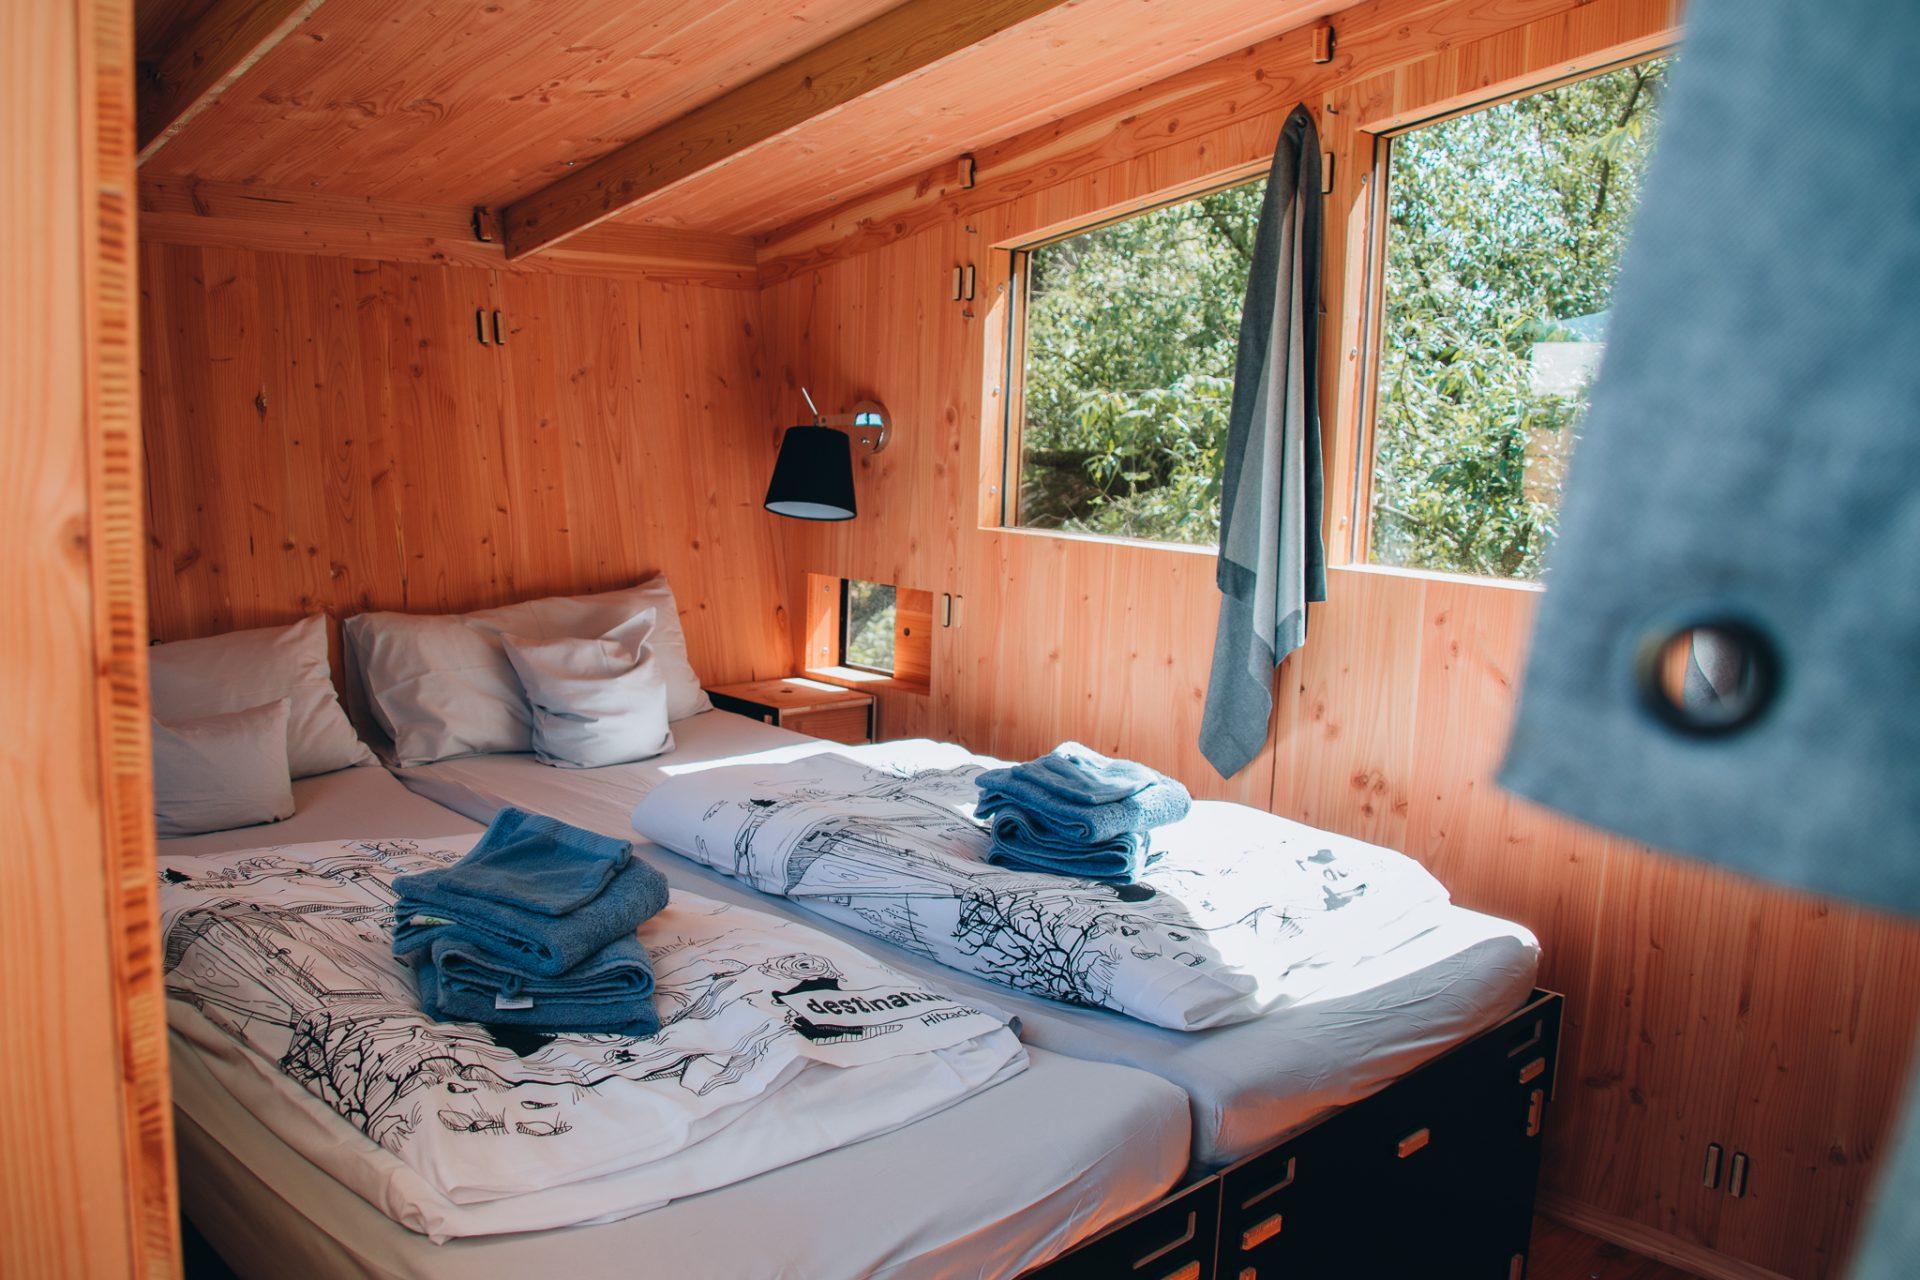 destinature-dorf-tiny-house-urlaub-hütte-plus-